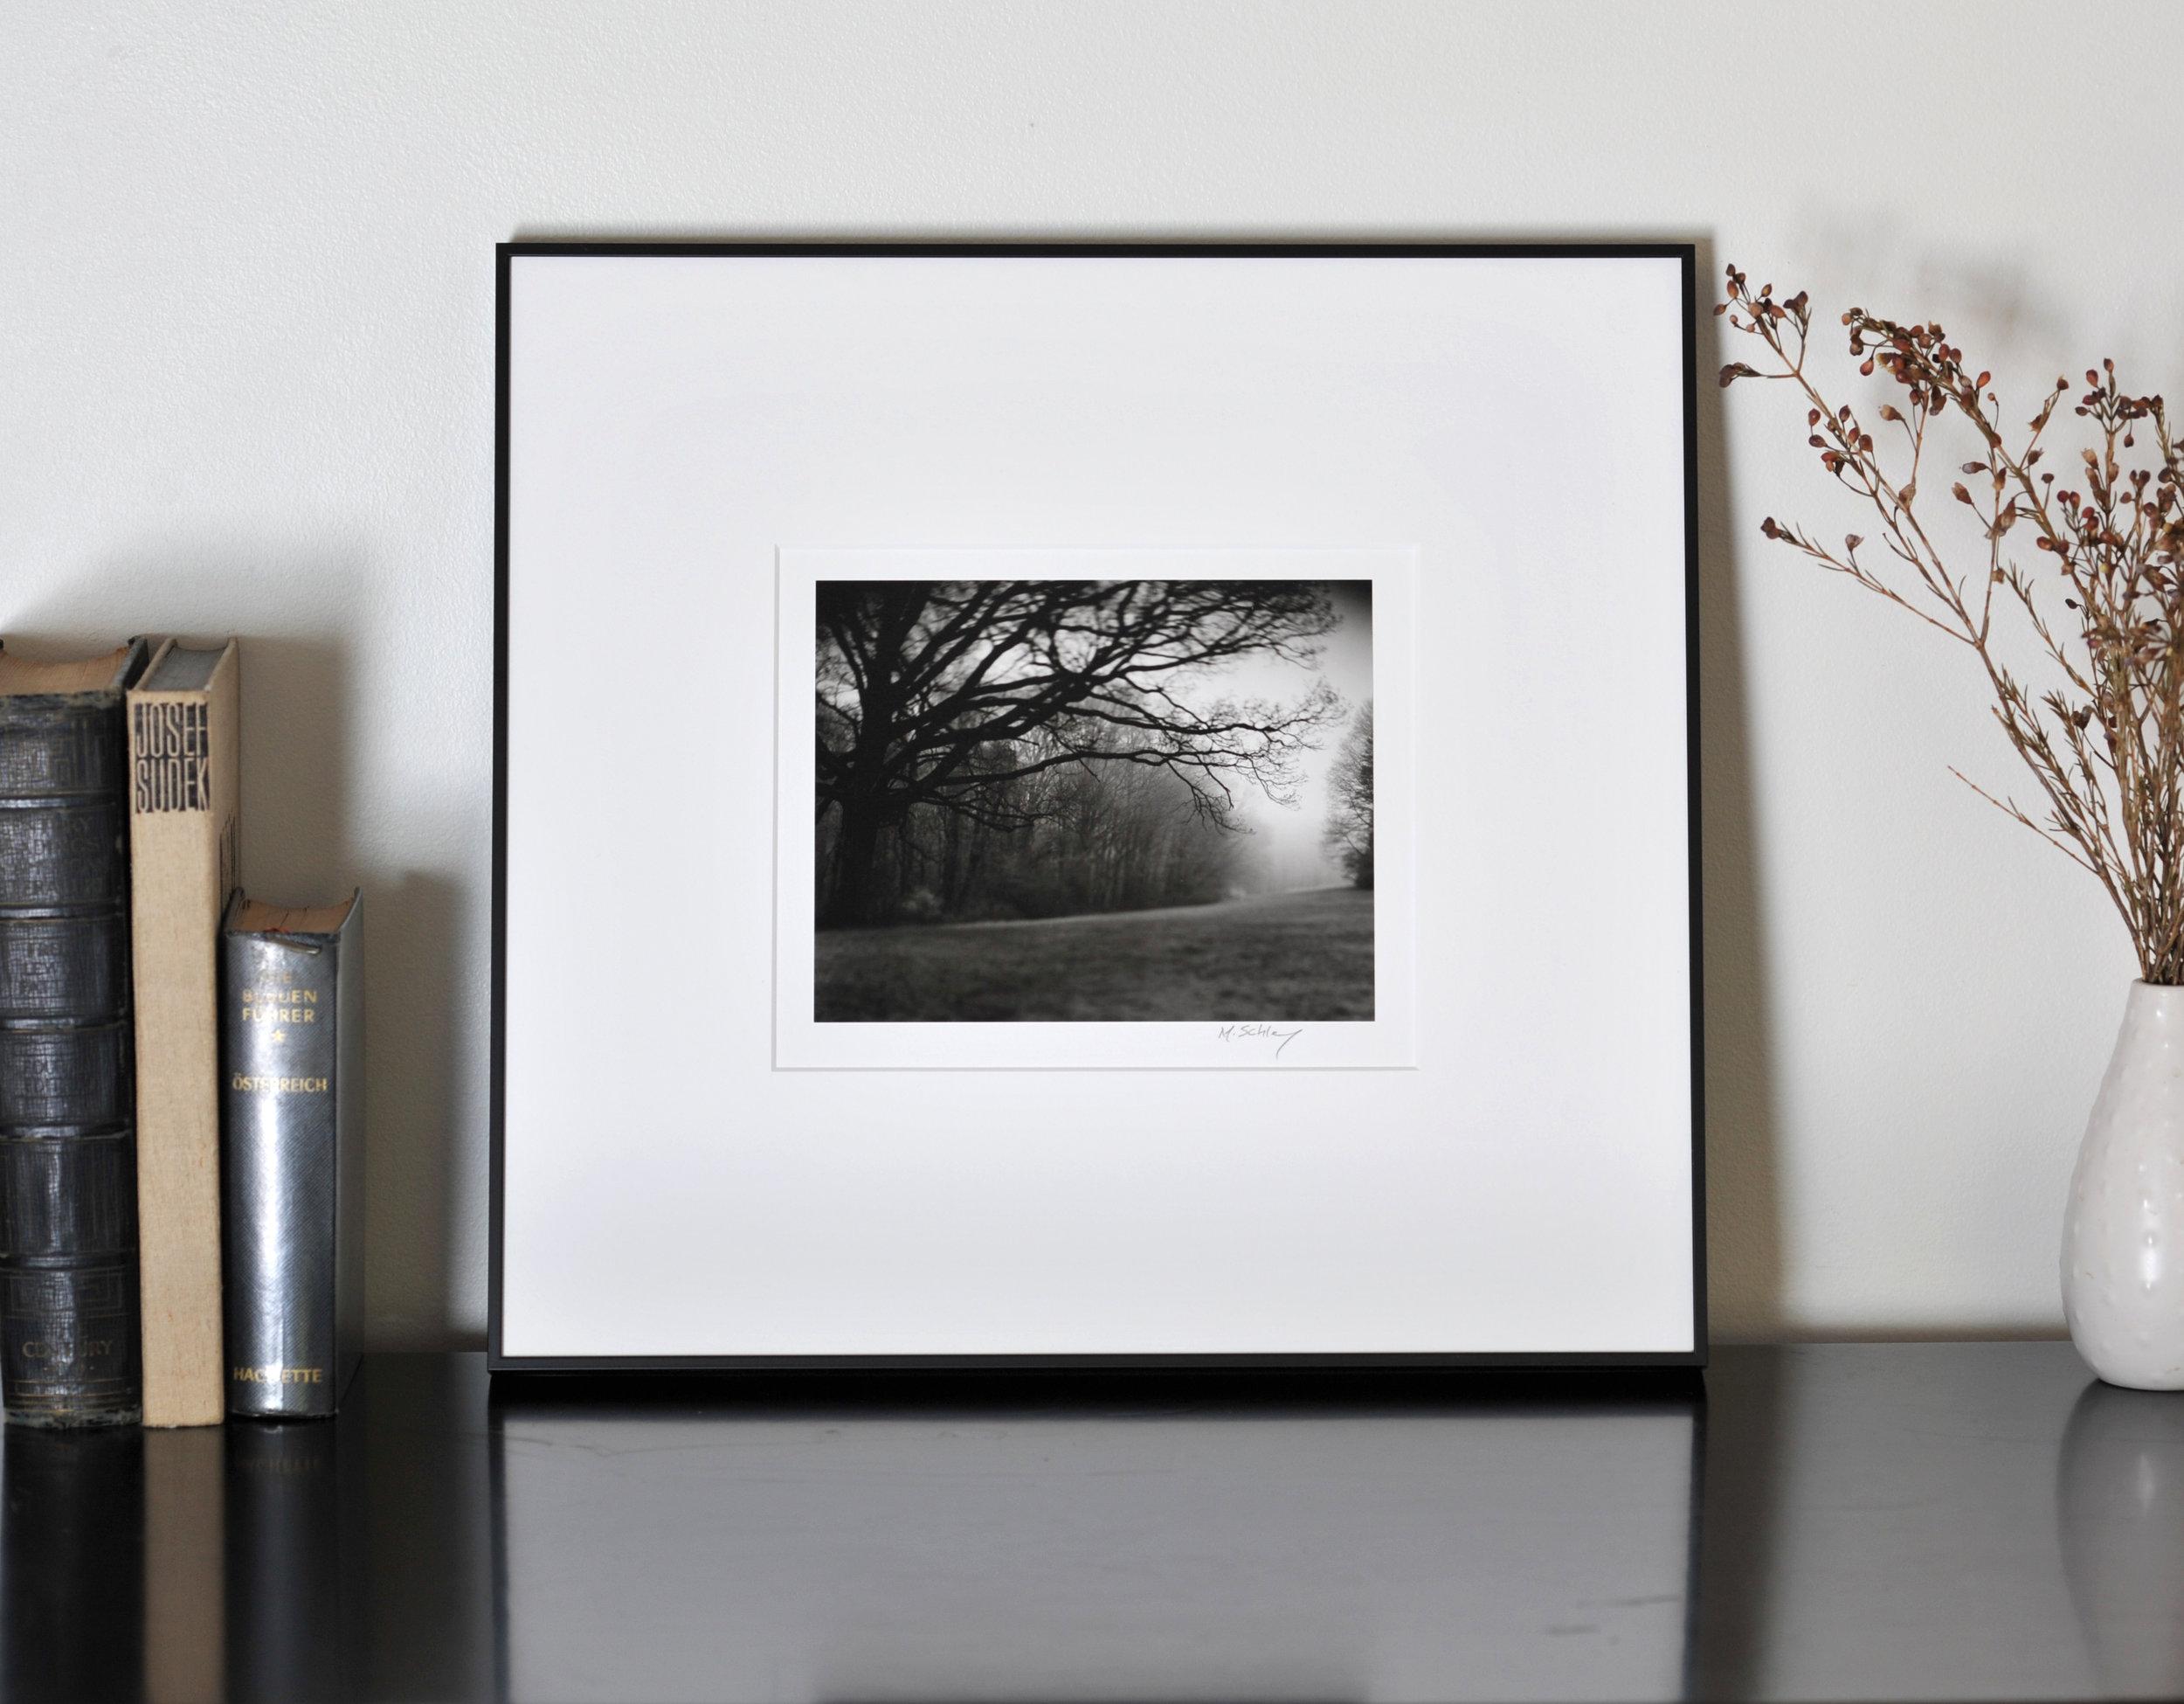 Framed Gelatin Silver Print